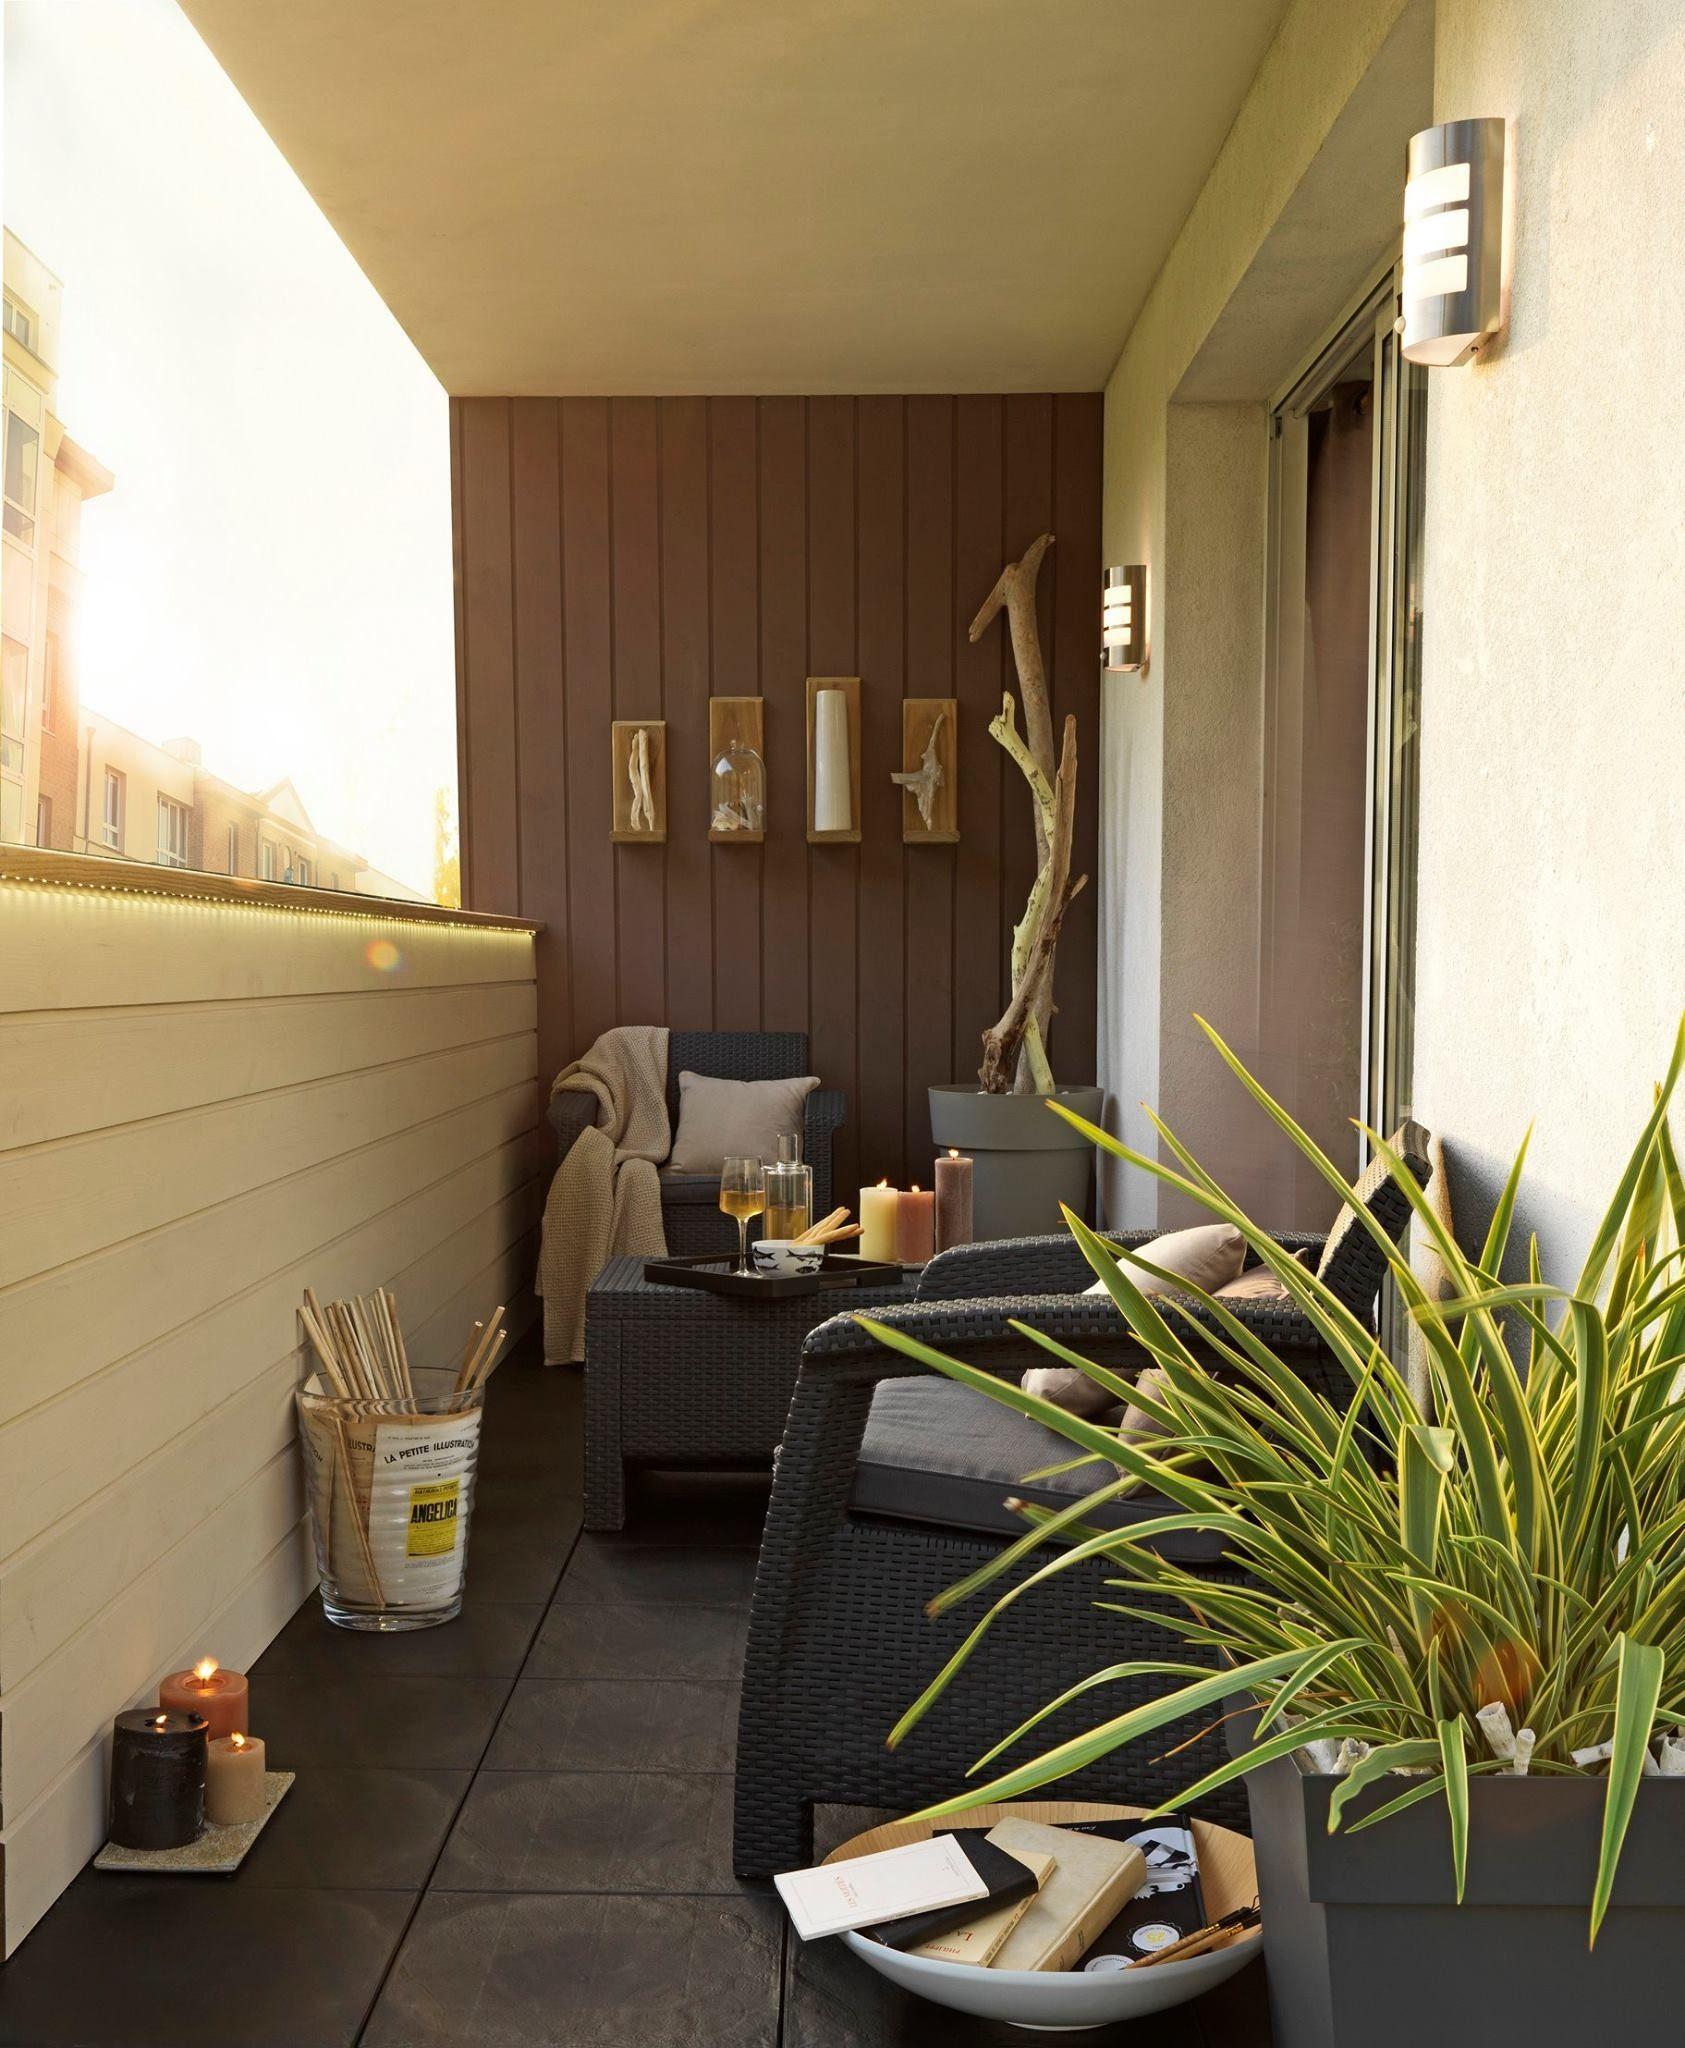 Pin By Cinzia Occhioni On Casa Dolce Casa Pinterest ~ Redes Para Balcones Leroy Merlin